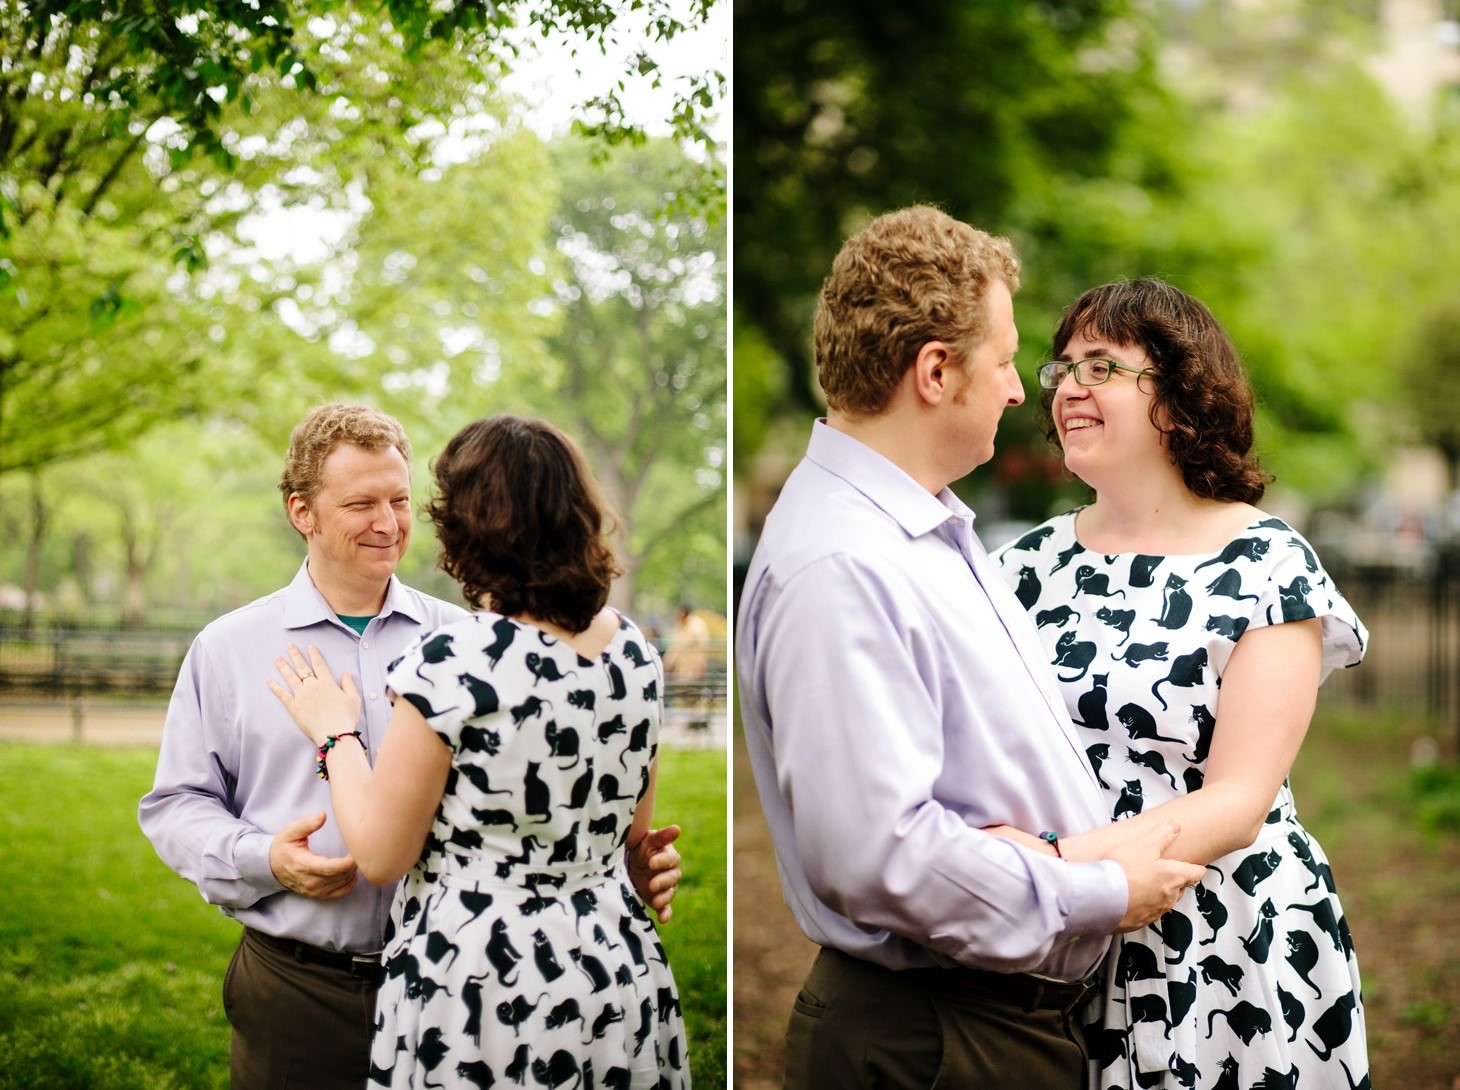 002-nyc-wedding-photographer-smitten-chickens-east-village-engagement-cats.jpg